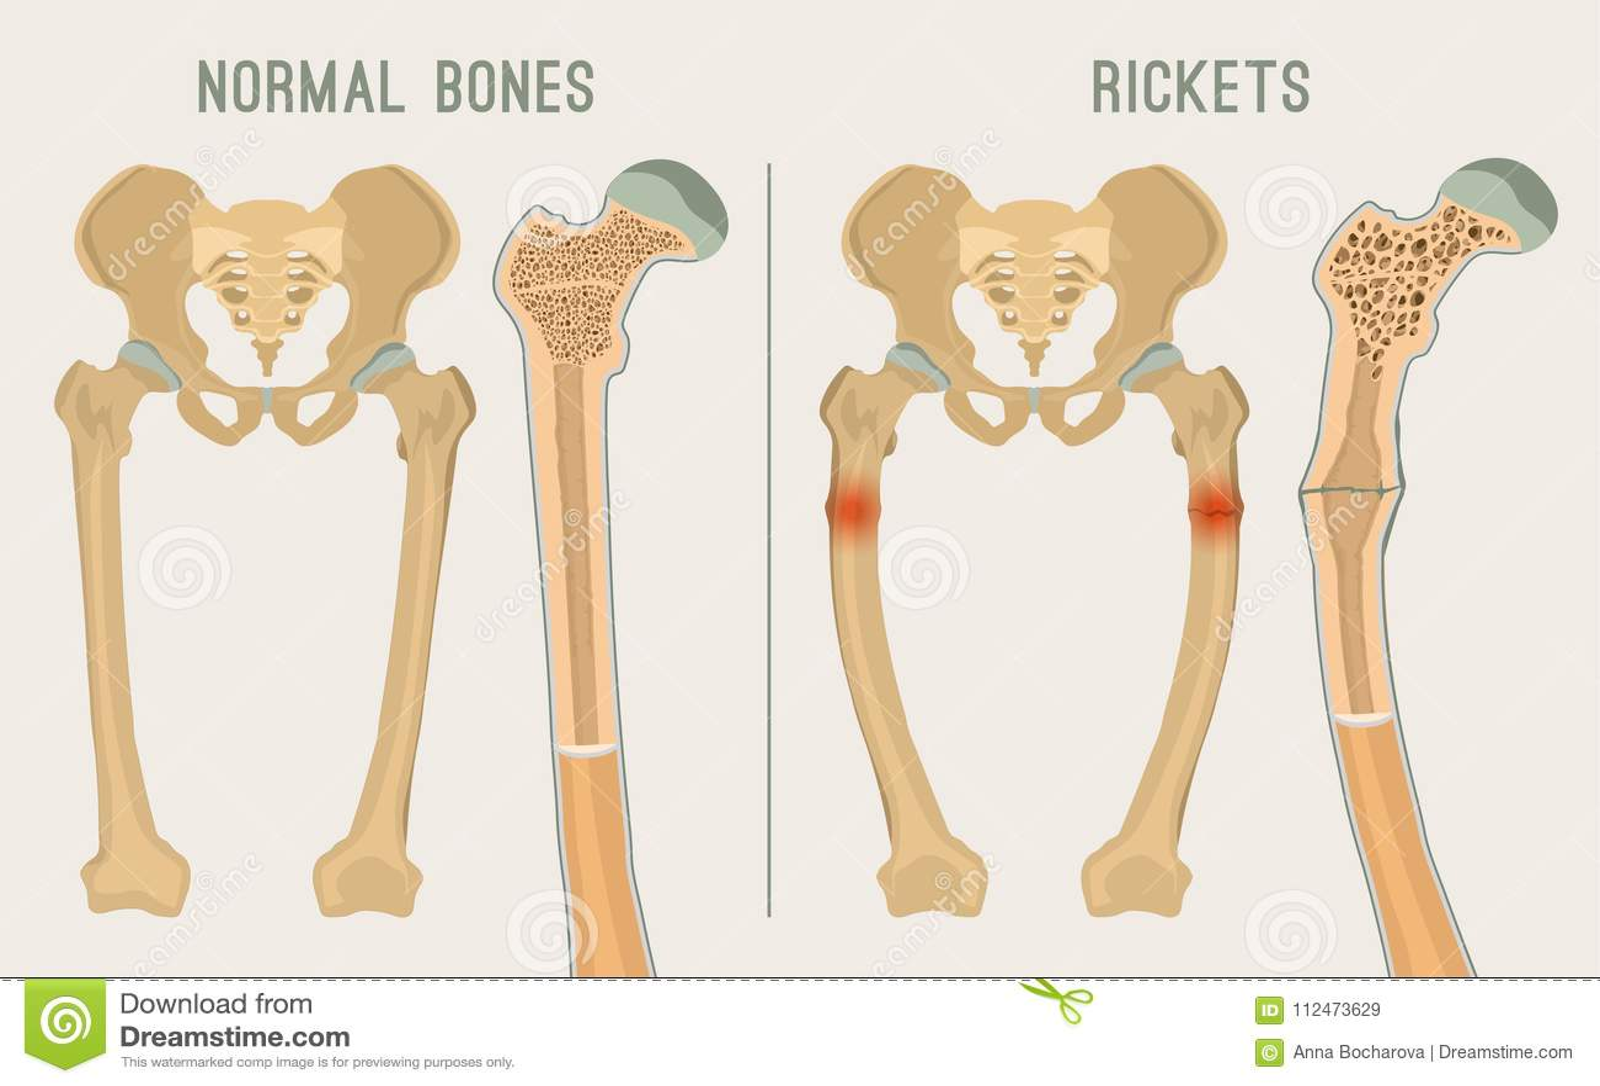 Rickets Cartoons, Illustrations & Vector Stock Images